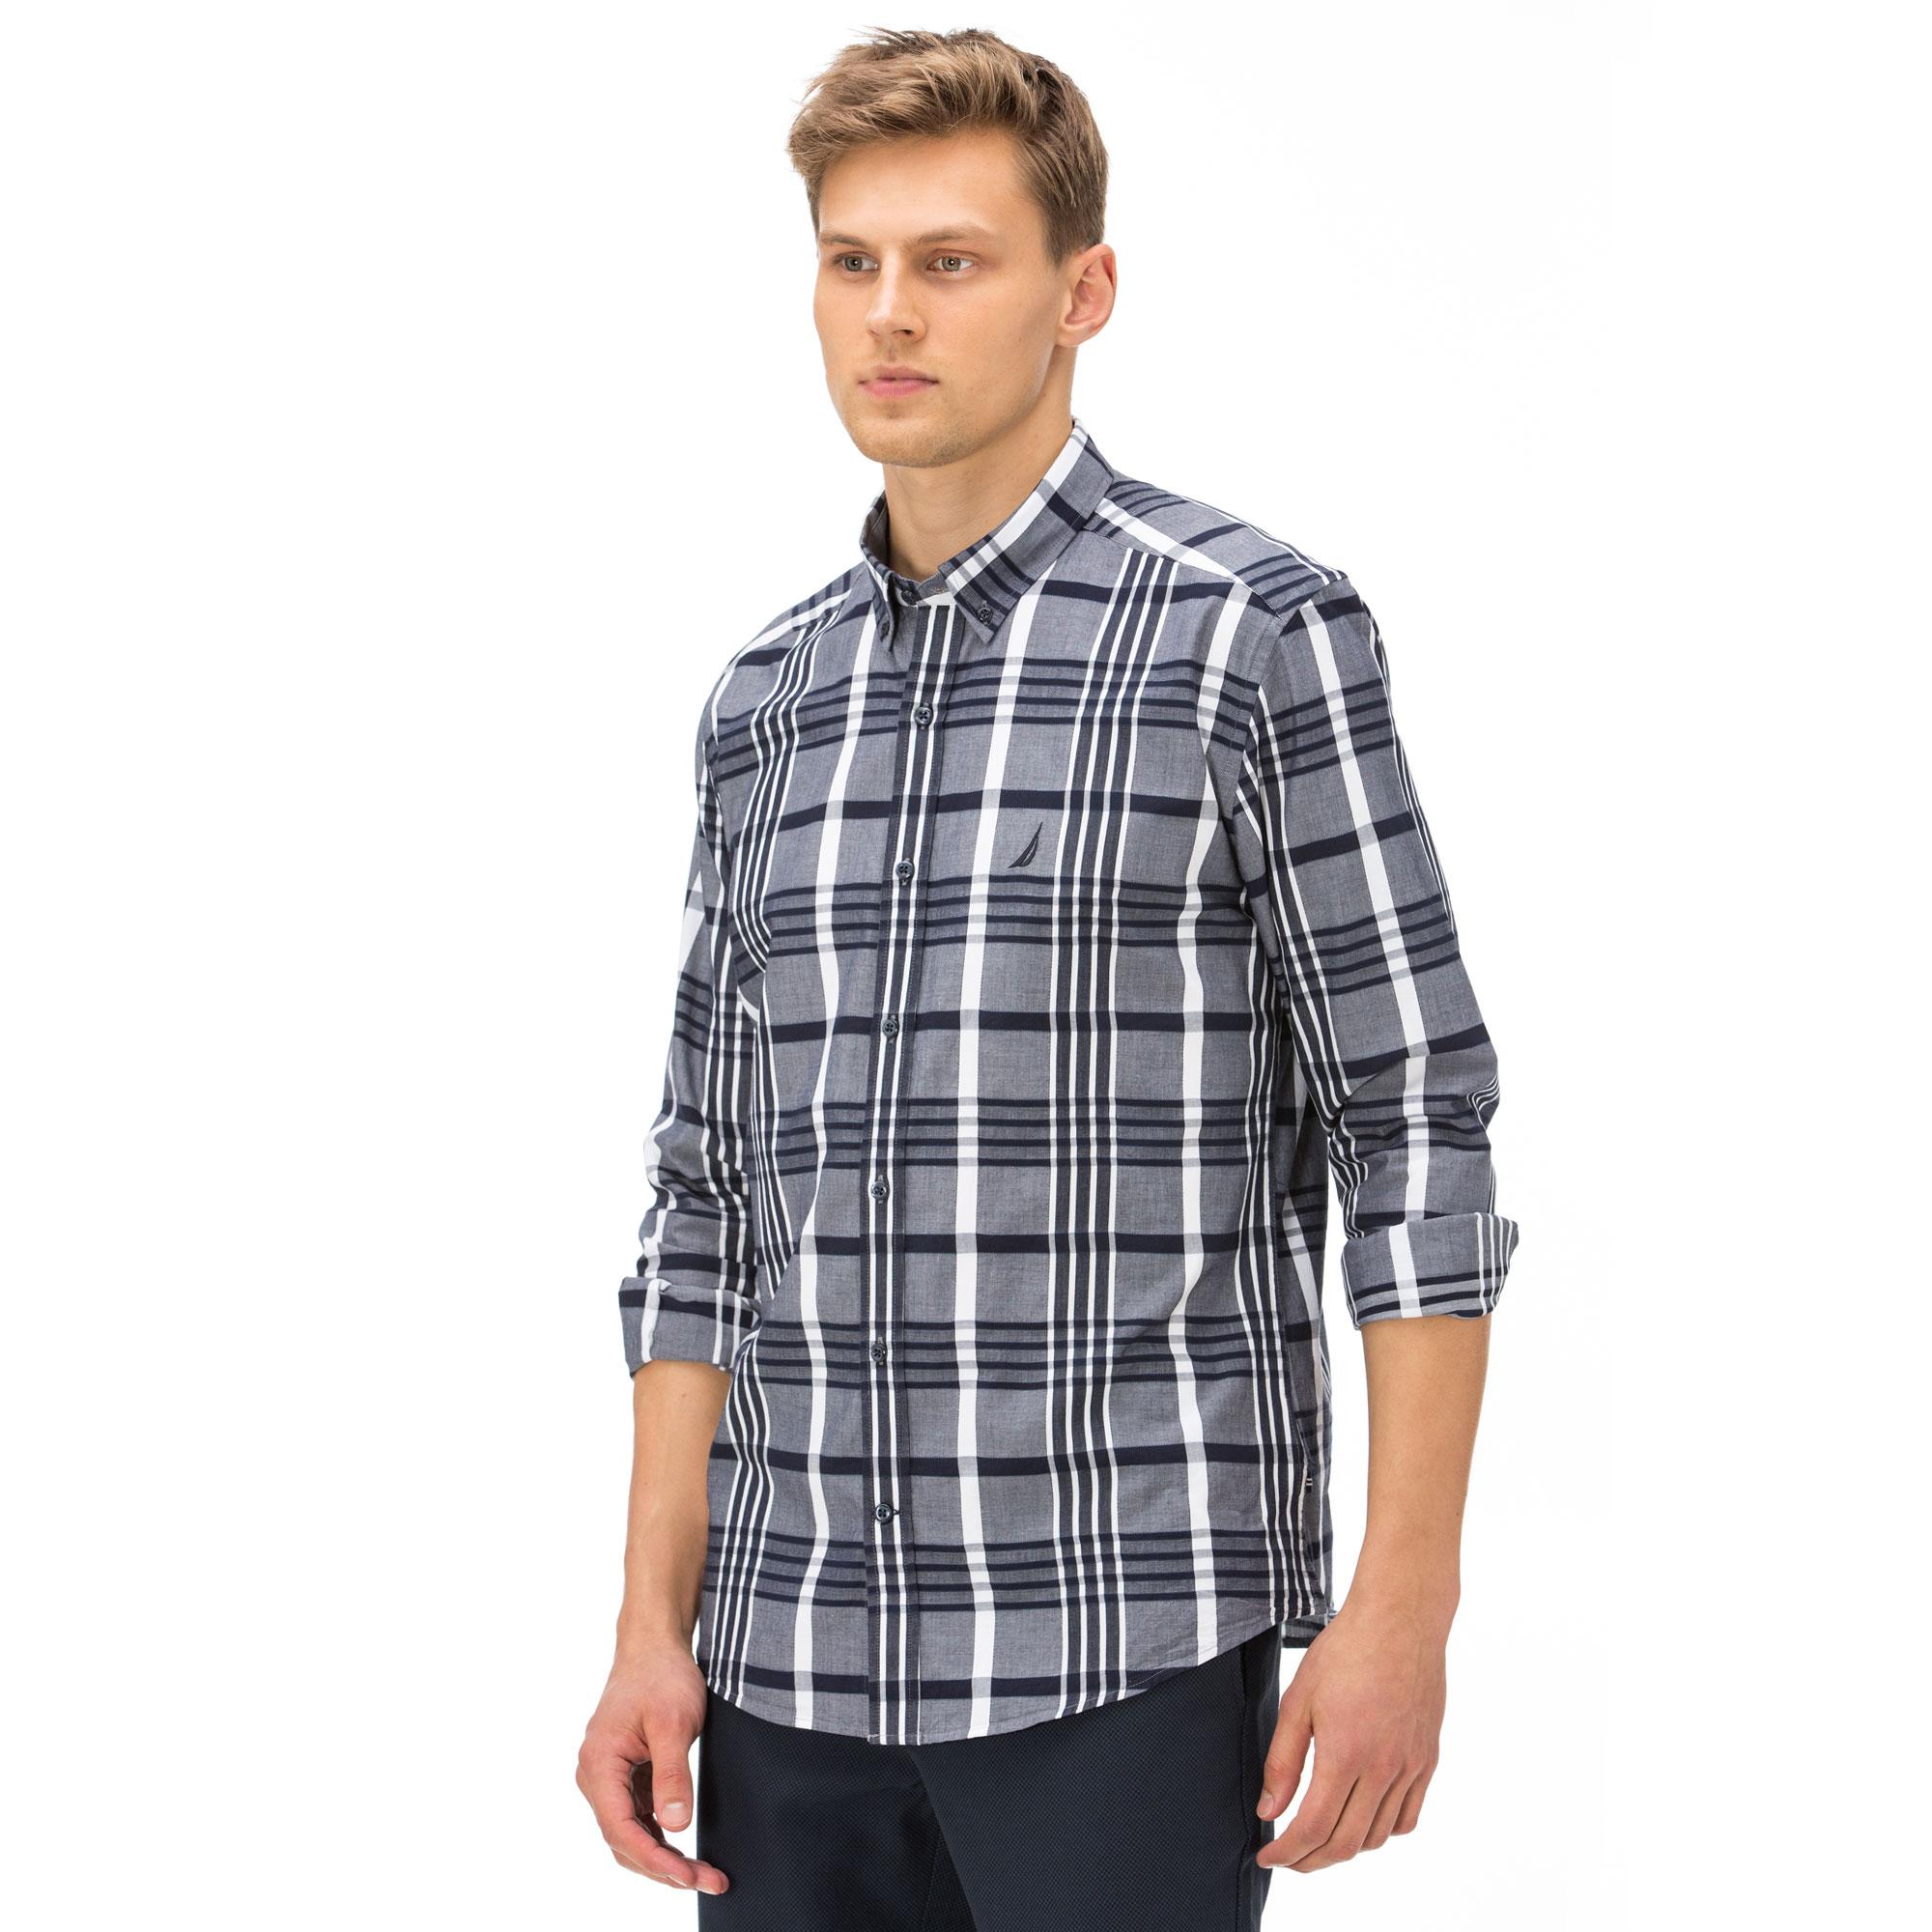 Nautica Erkek Slim Fit Gri - Lacivert Ekoseli Gömlek